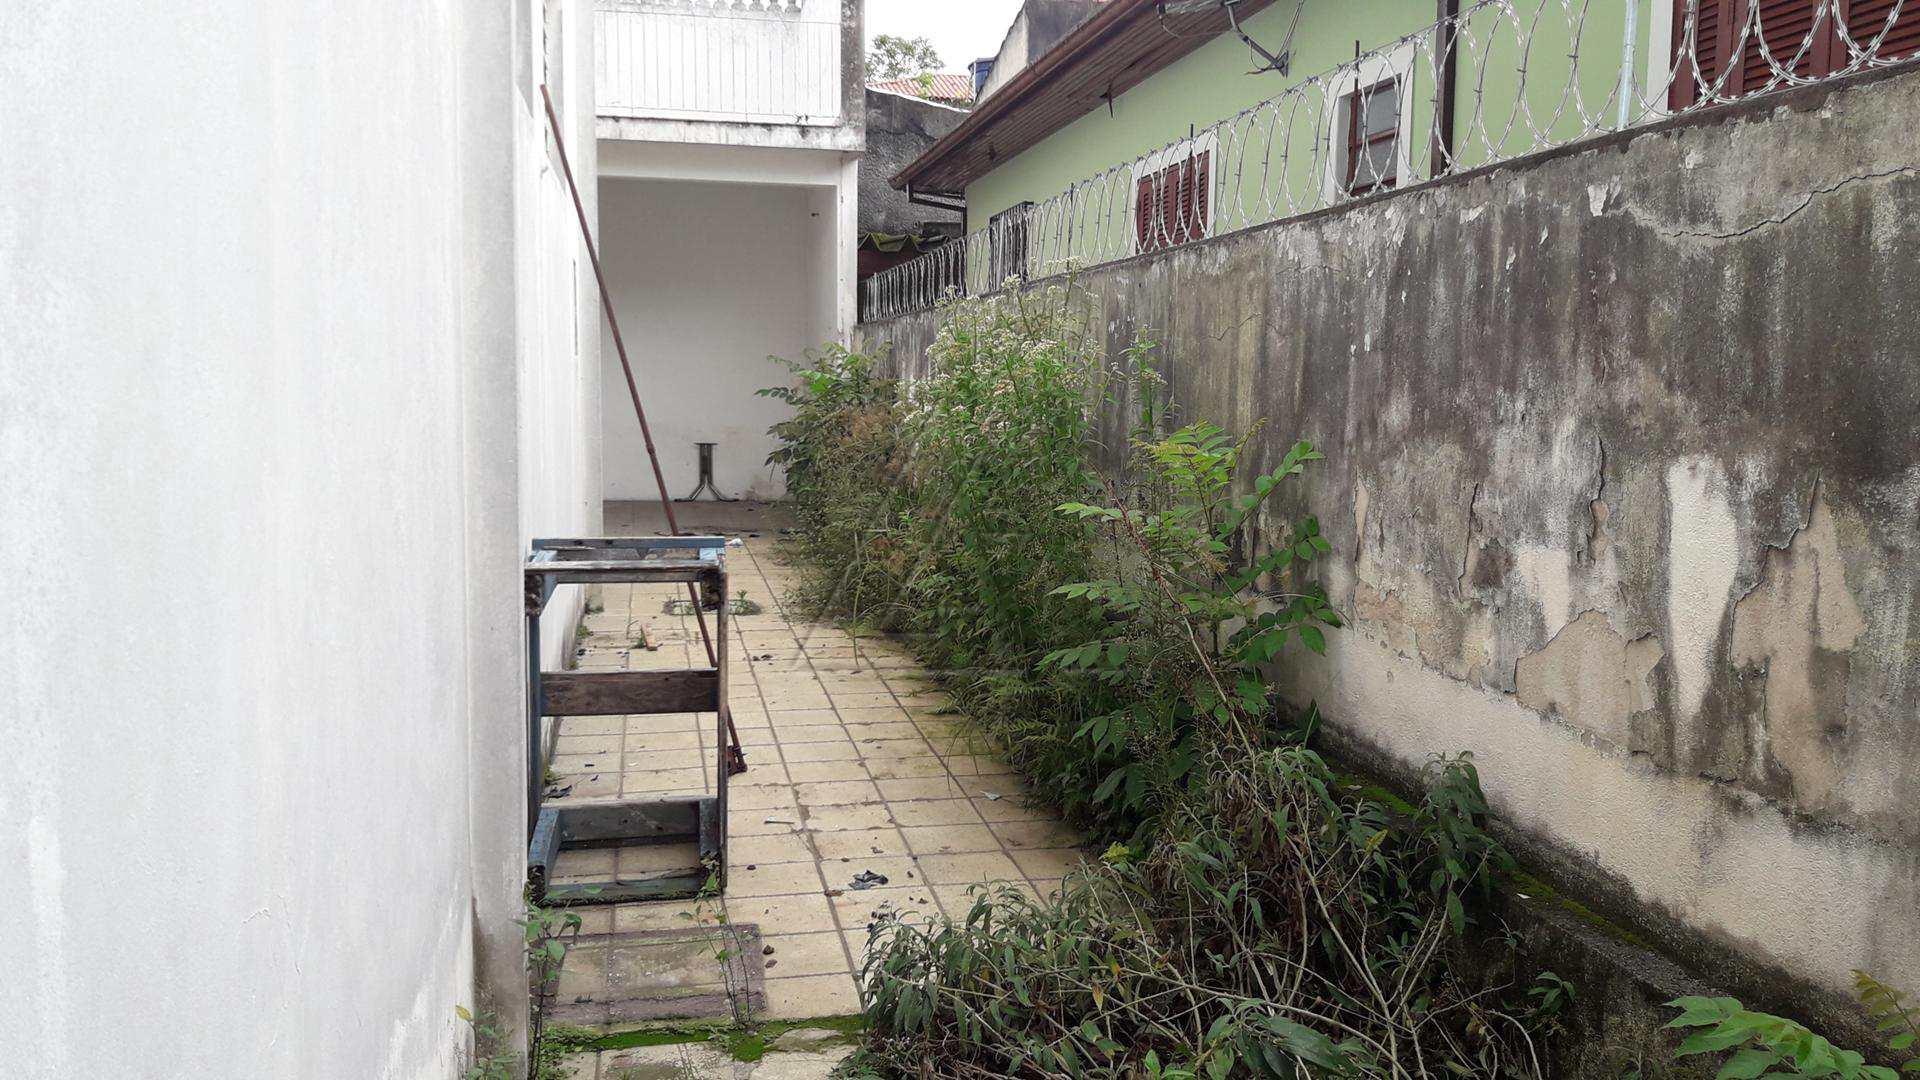 Casa com 2 dorms, Jardim Colombo, São Paulo - R$ 680 mil, Cod: 2945